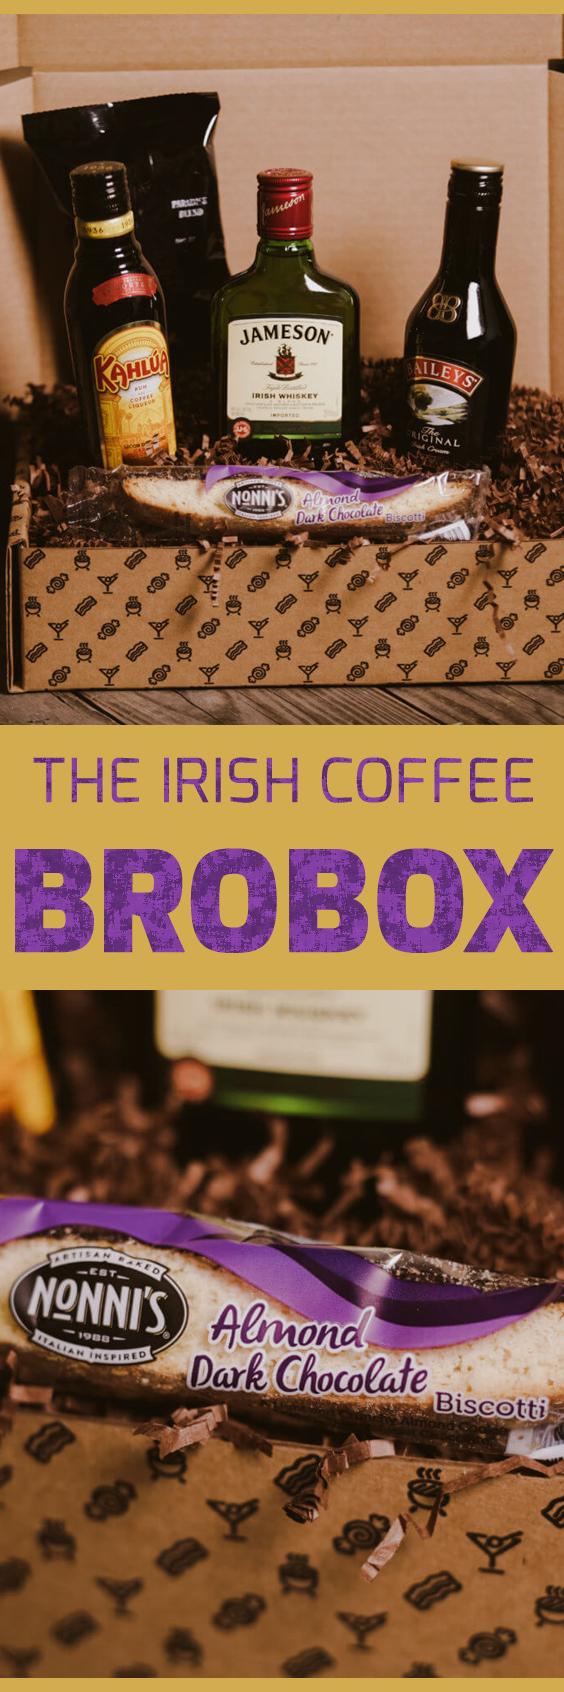 The Irish Coffee BroBox Irish coffee, Baileys irish